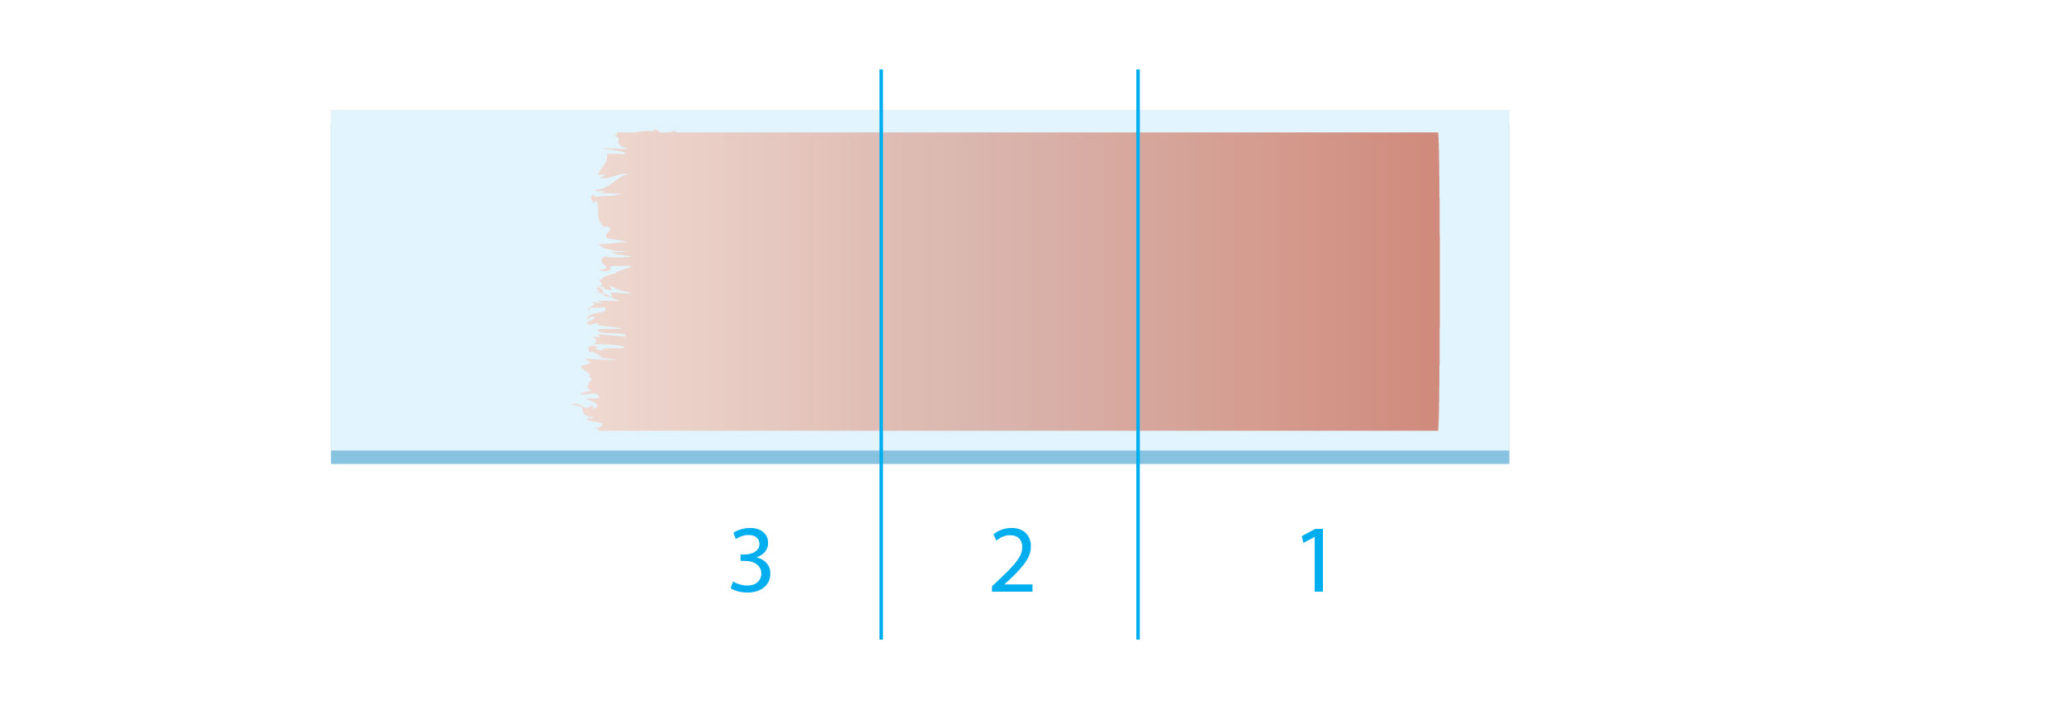 Lâmina Microscopia: 1 - Cabeça, 2 - Corpo e 3 - Cauda